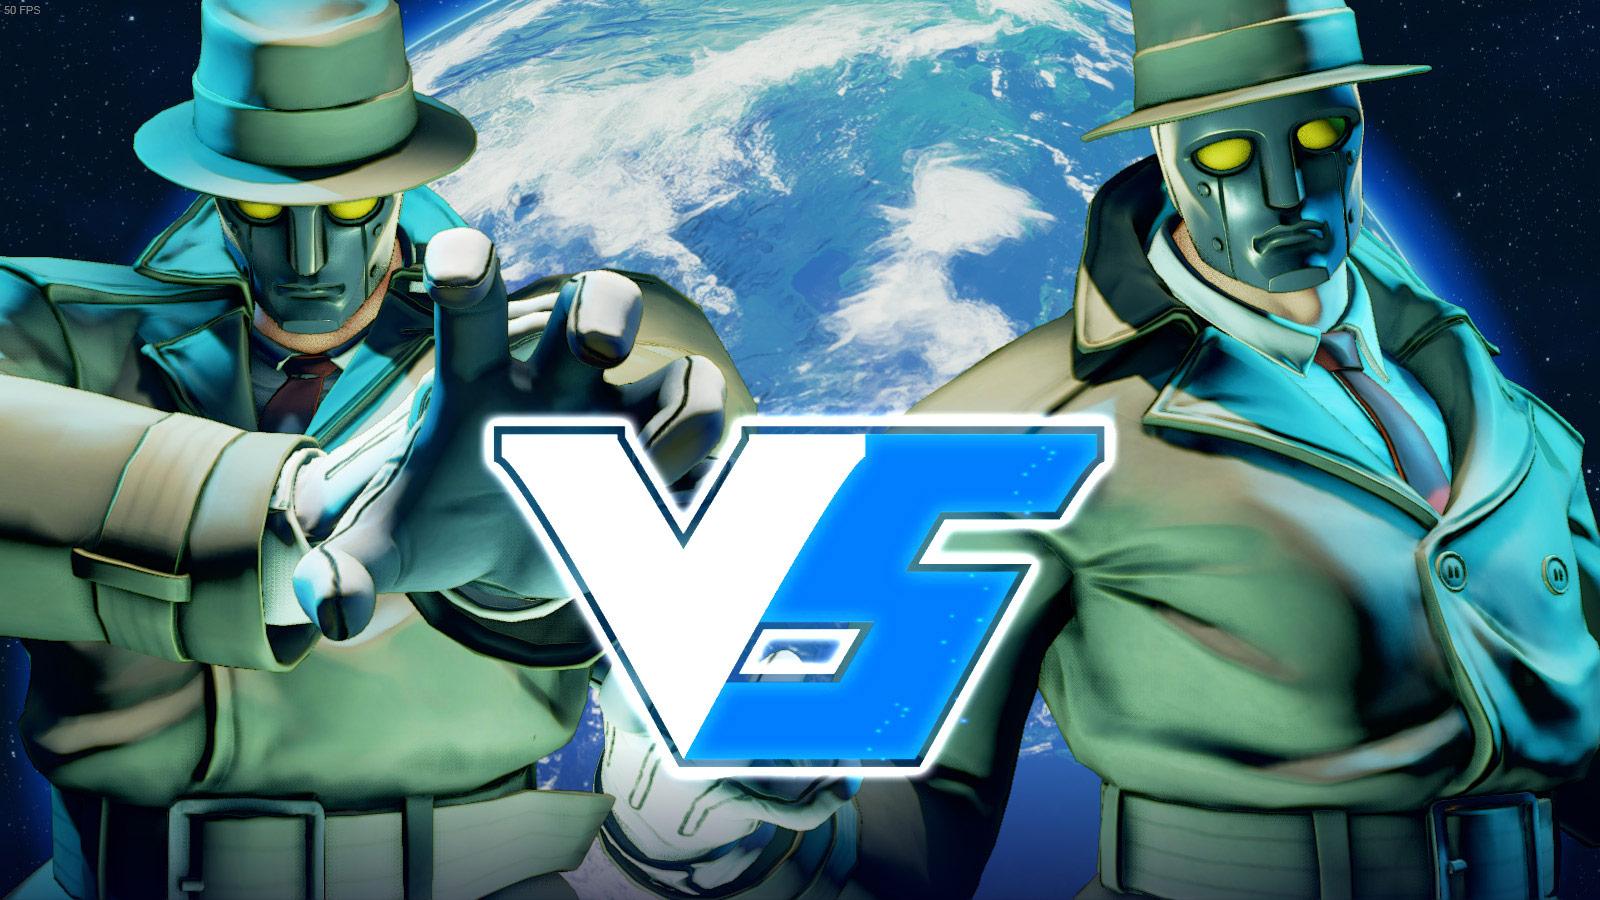 Q Street Fighter Street Fighter 5 Q mod...